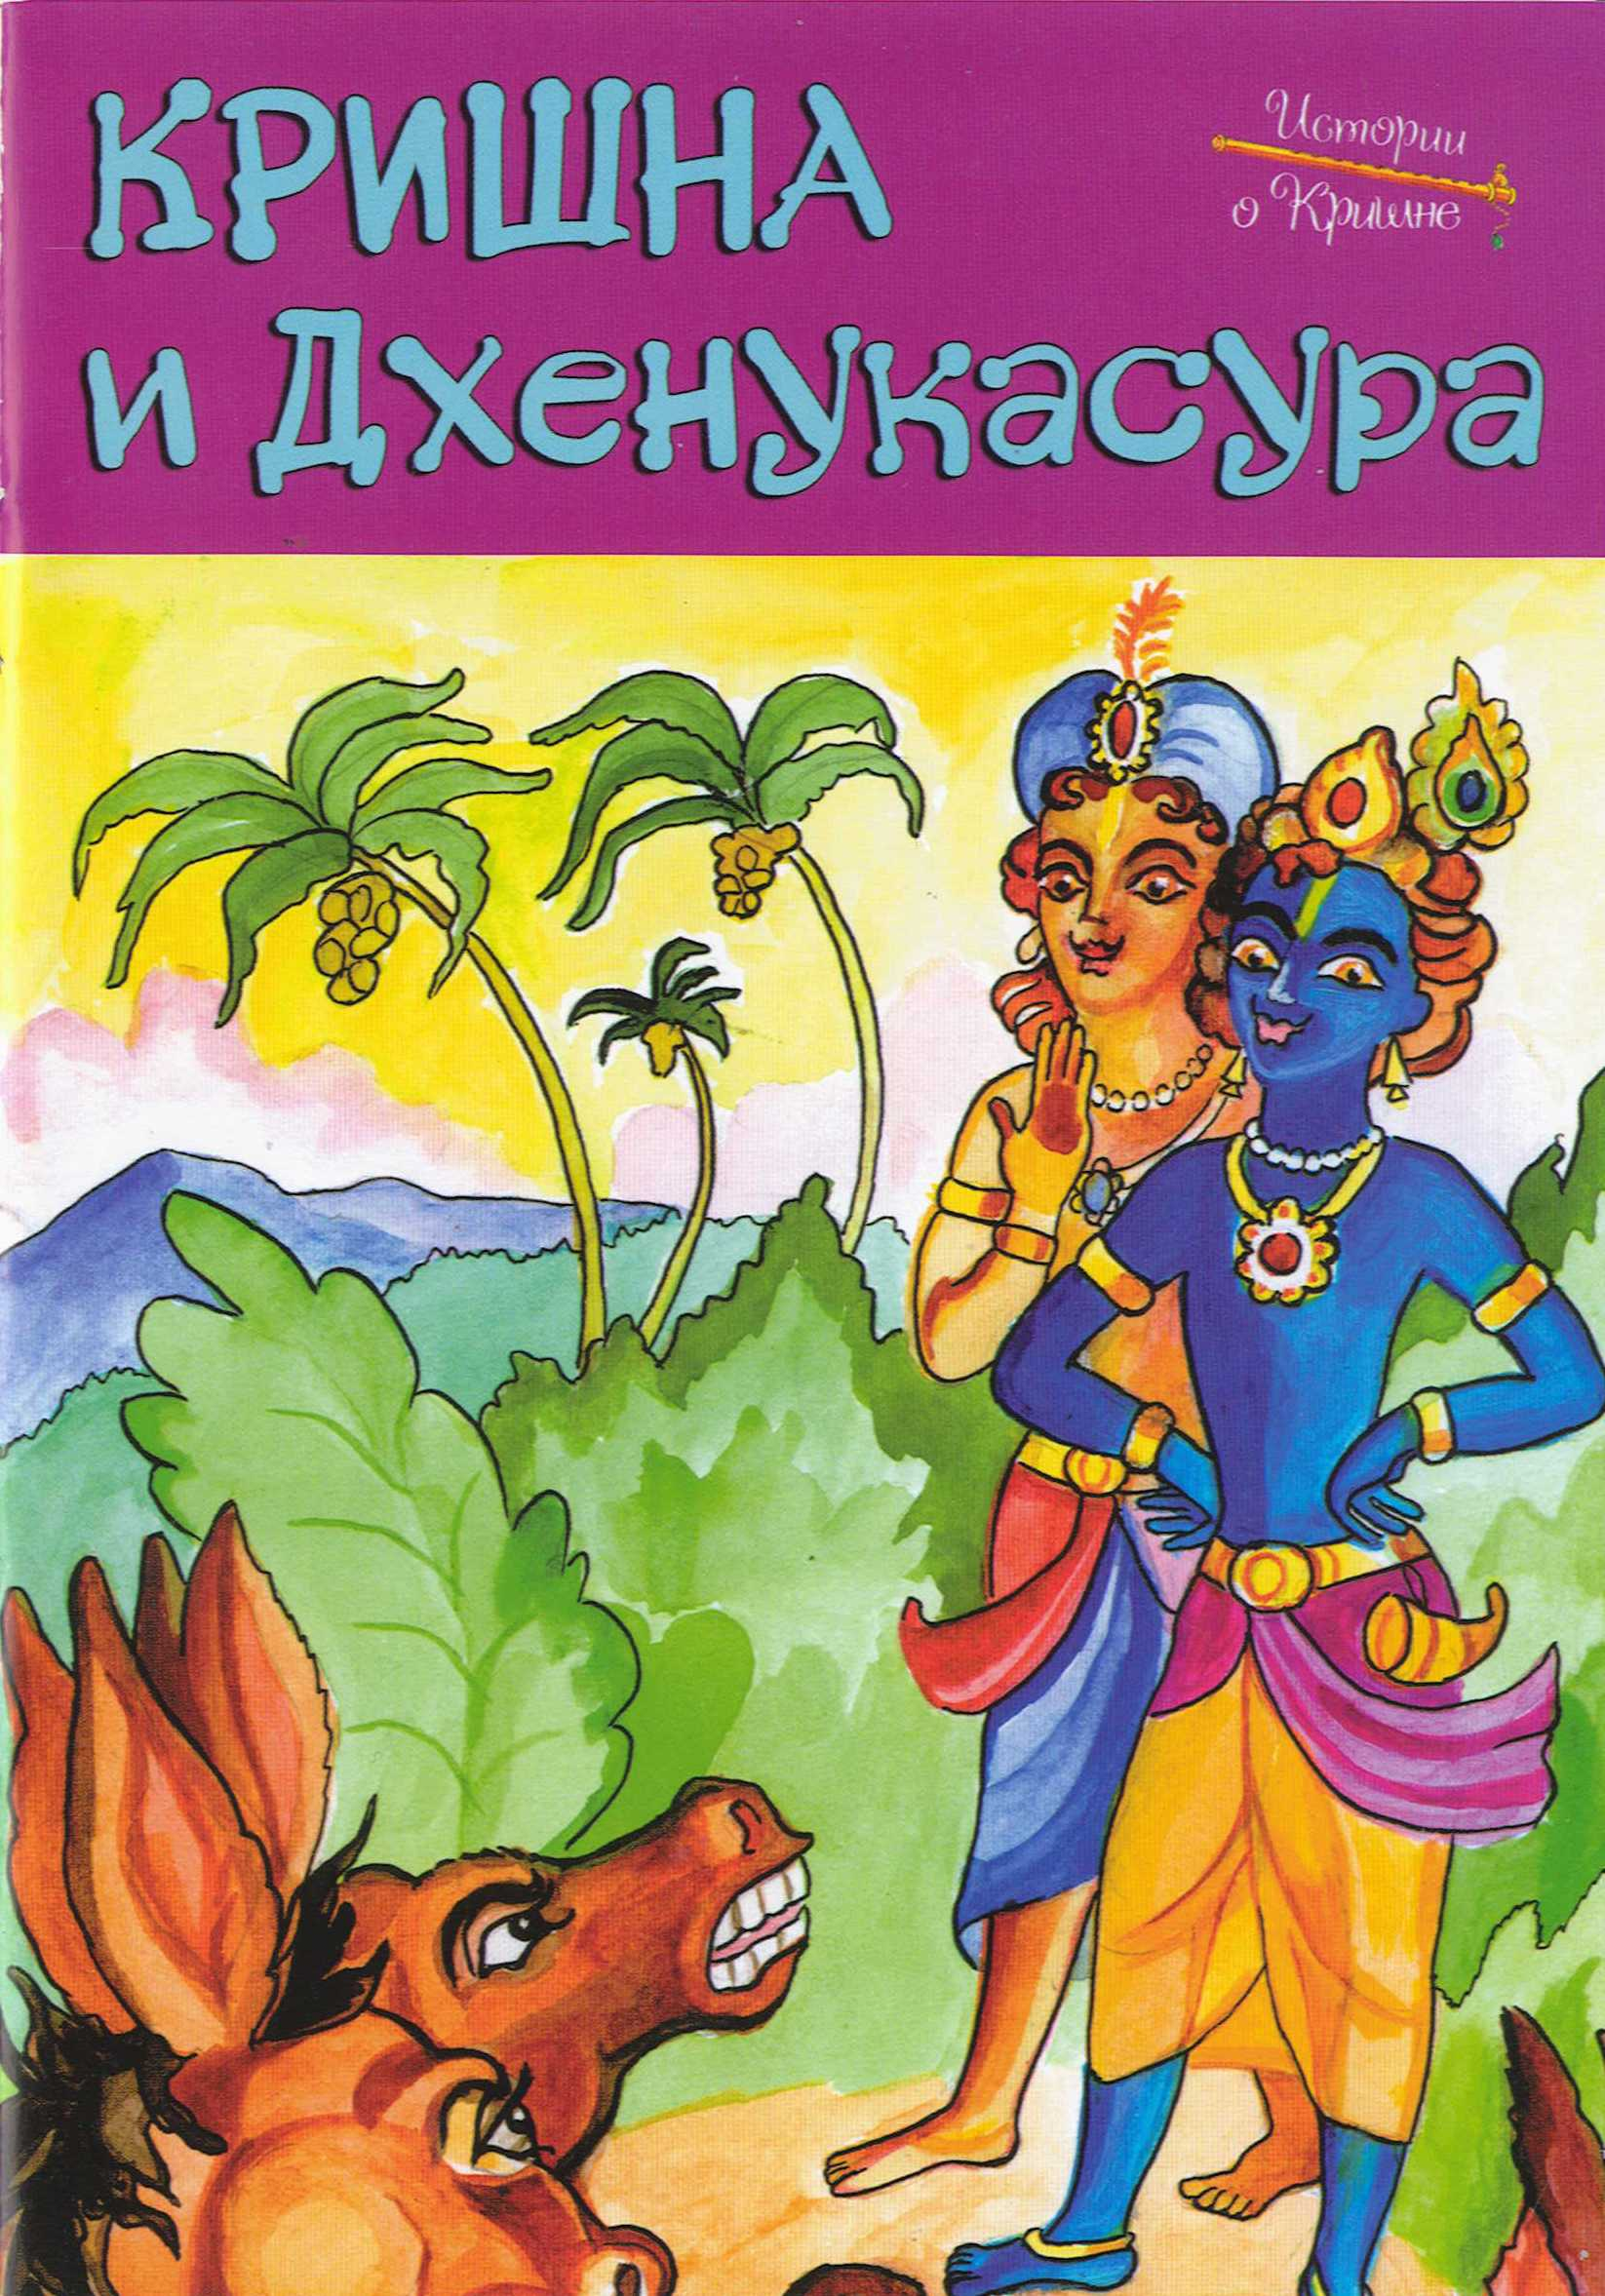 Истории о Кришне: Кришна и Дхенукасура